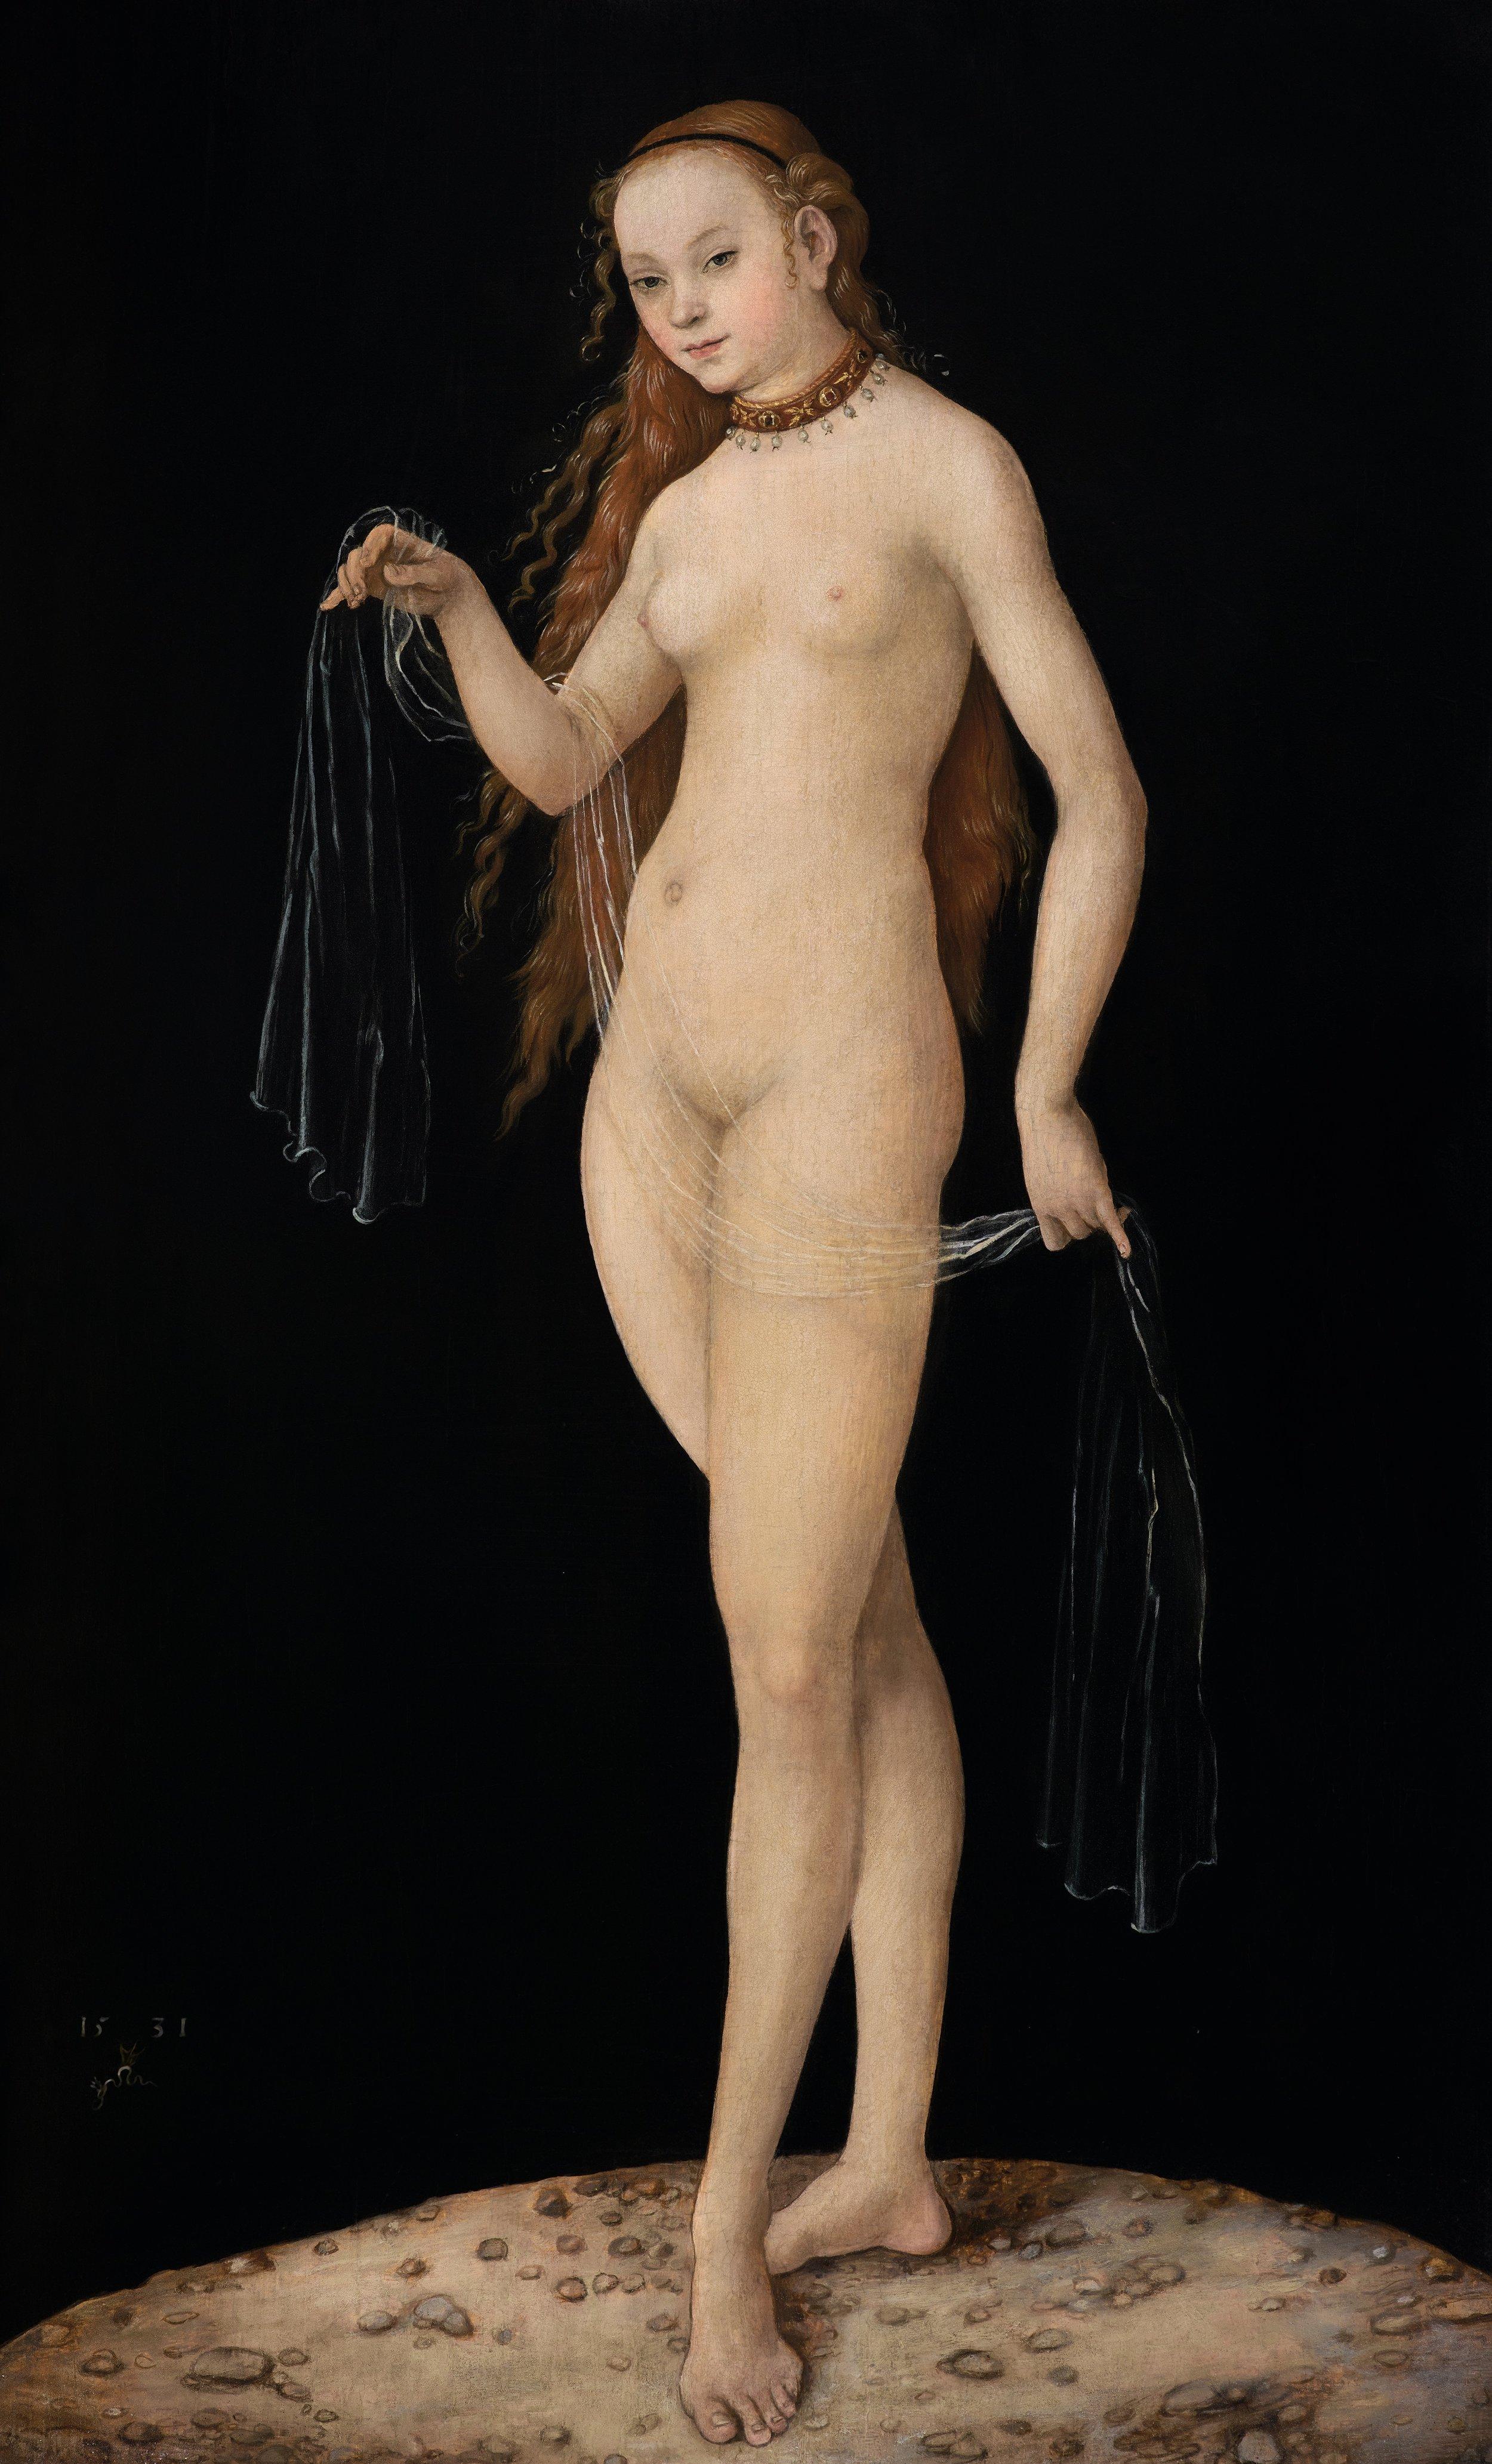 Venus , 1531, attributed to Lucas Cranach the Elder